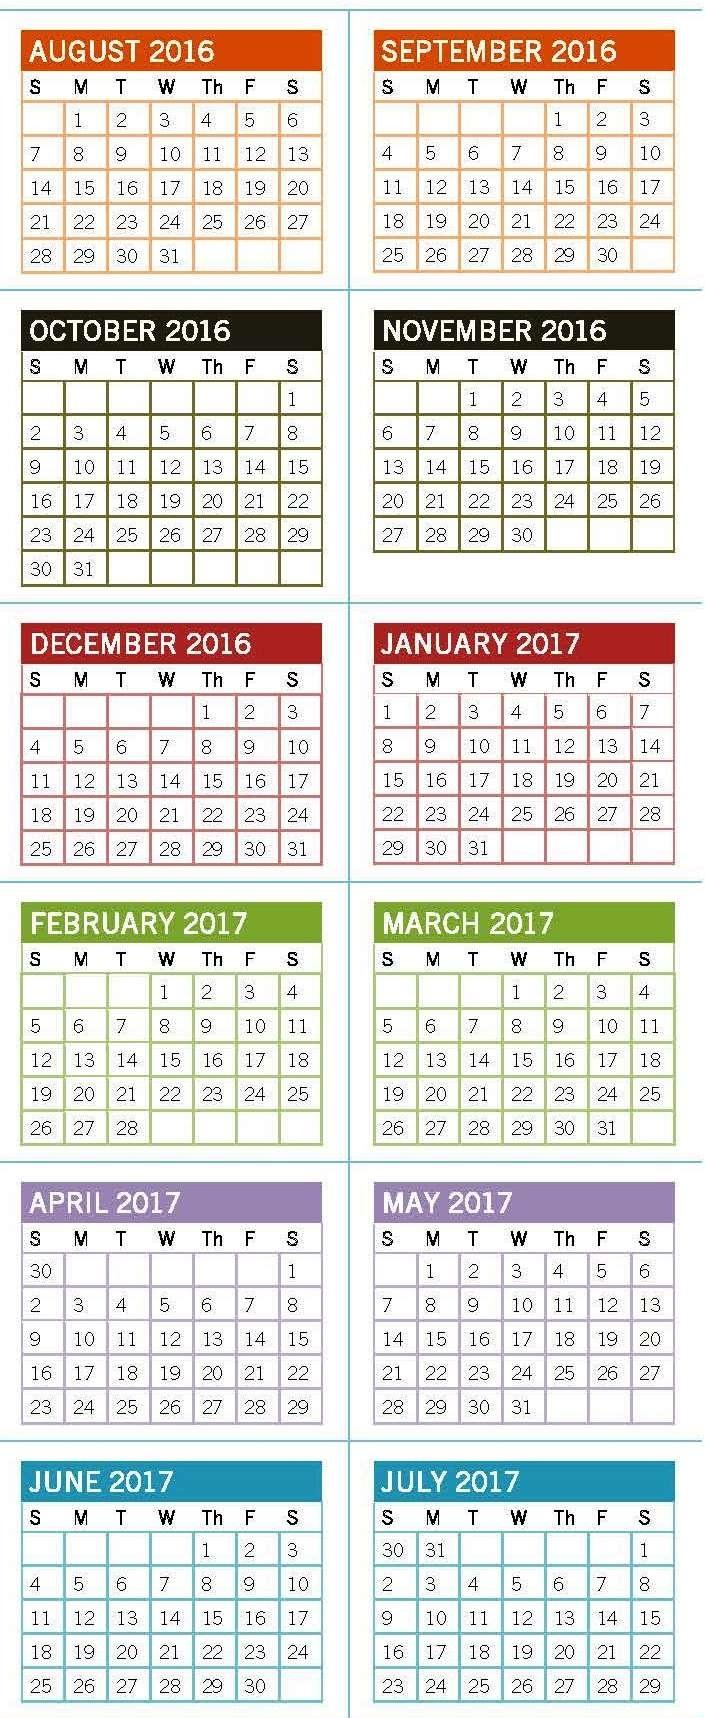 Academic Calendar - University Of North Carolina At